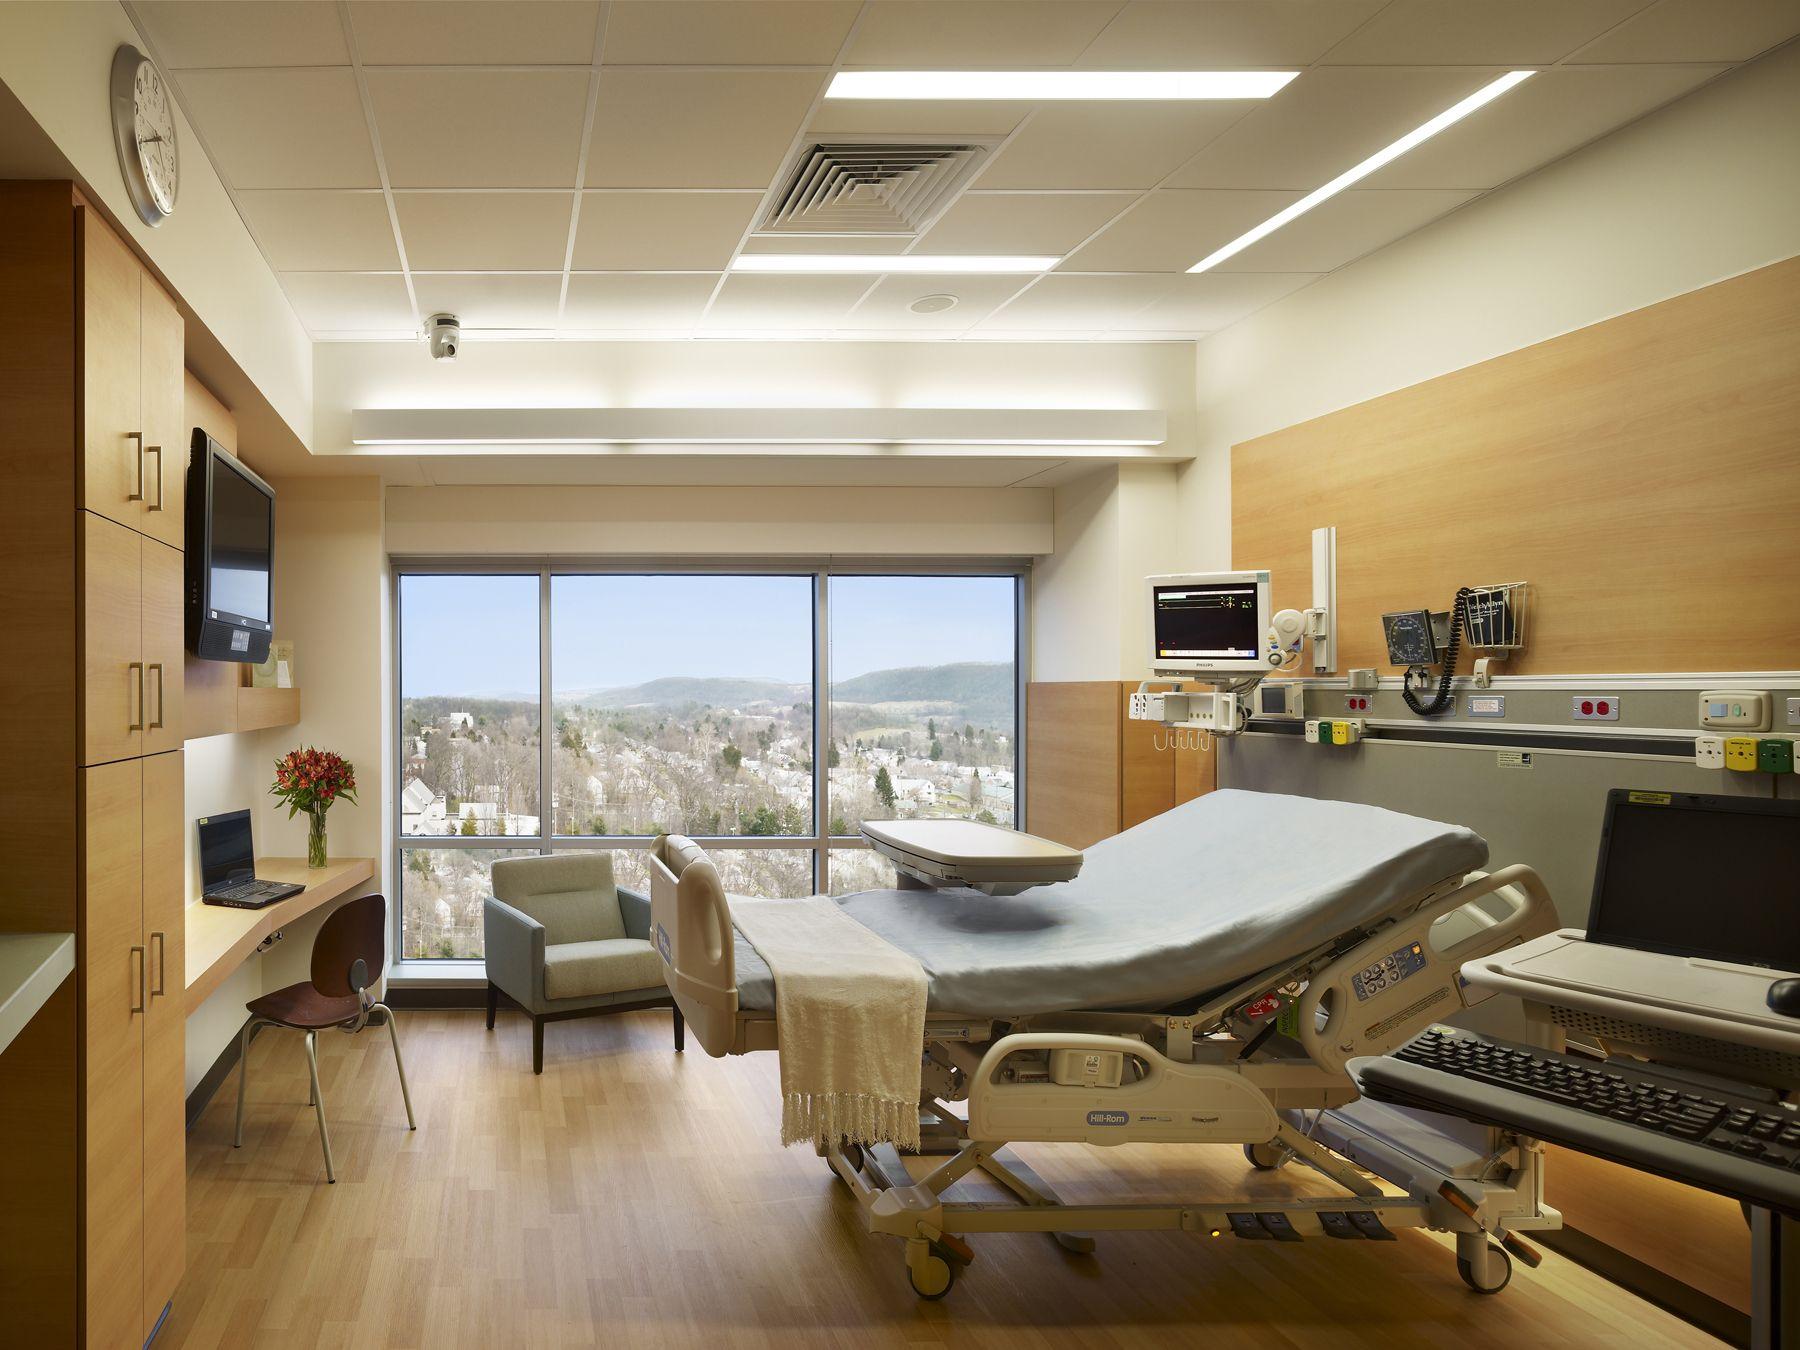 Geisinger health system hospital interior hospital